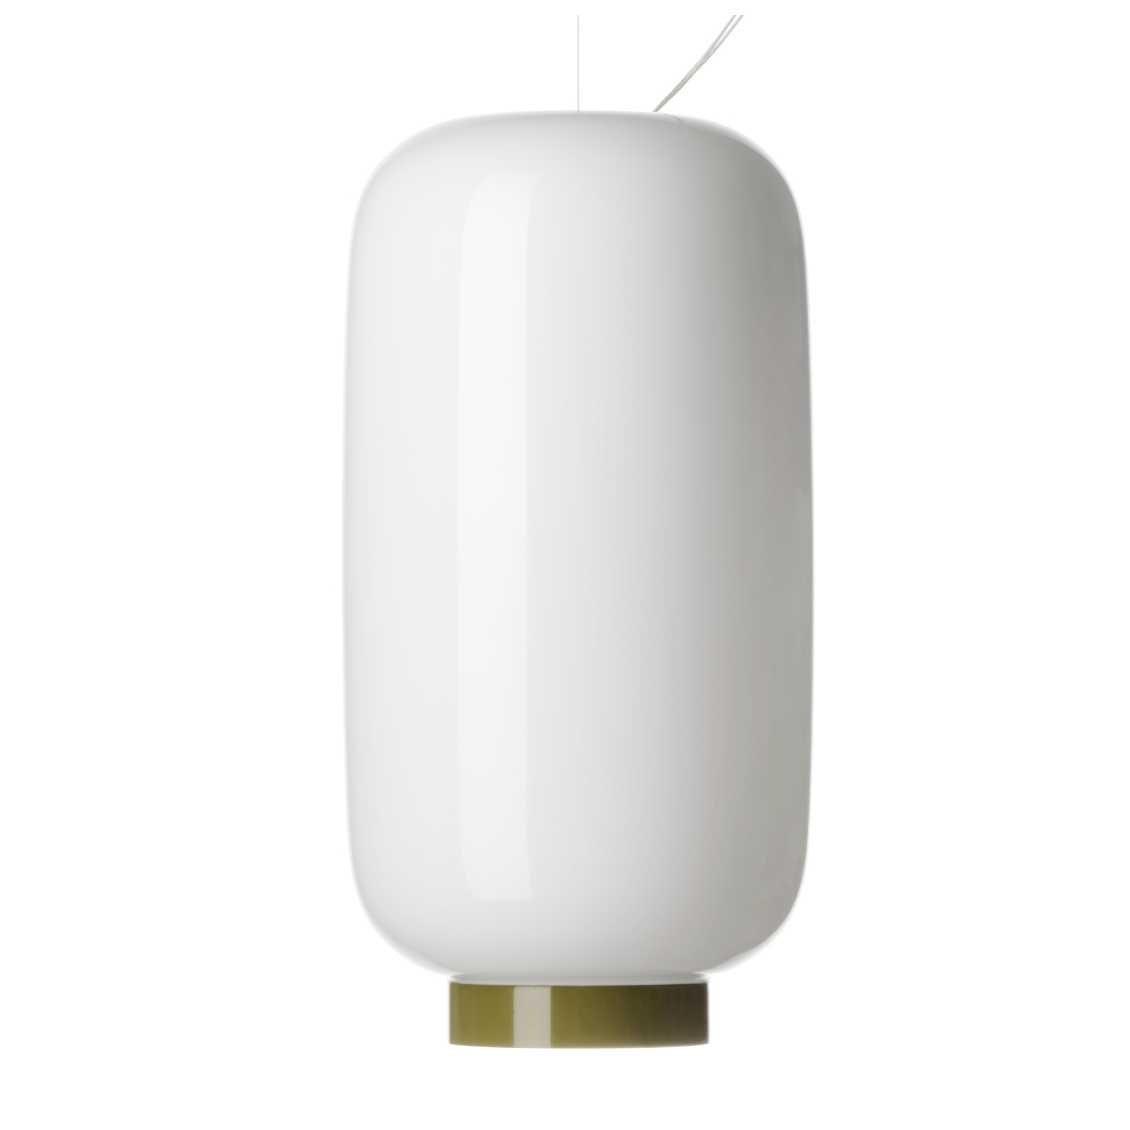 Foscarini Chouchin 2 Reverse Hanglamp